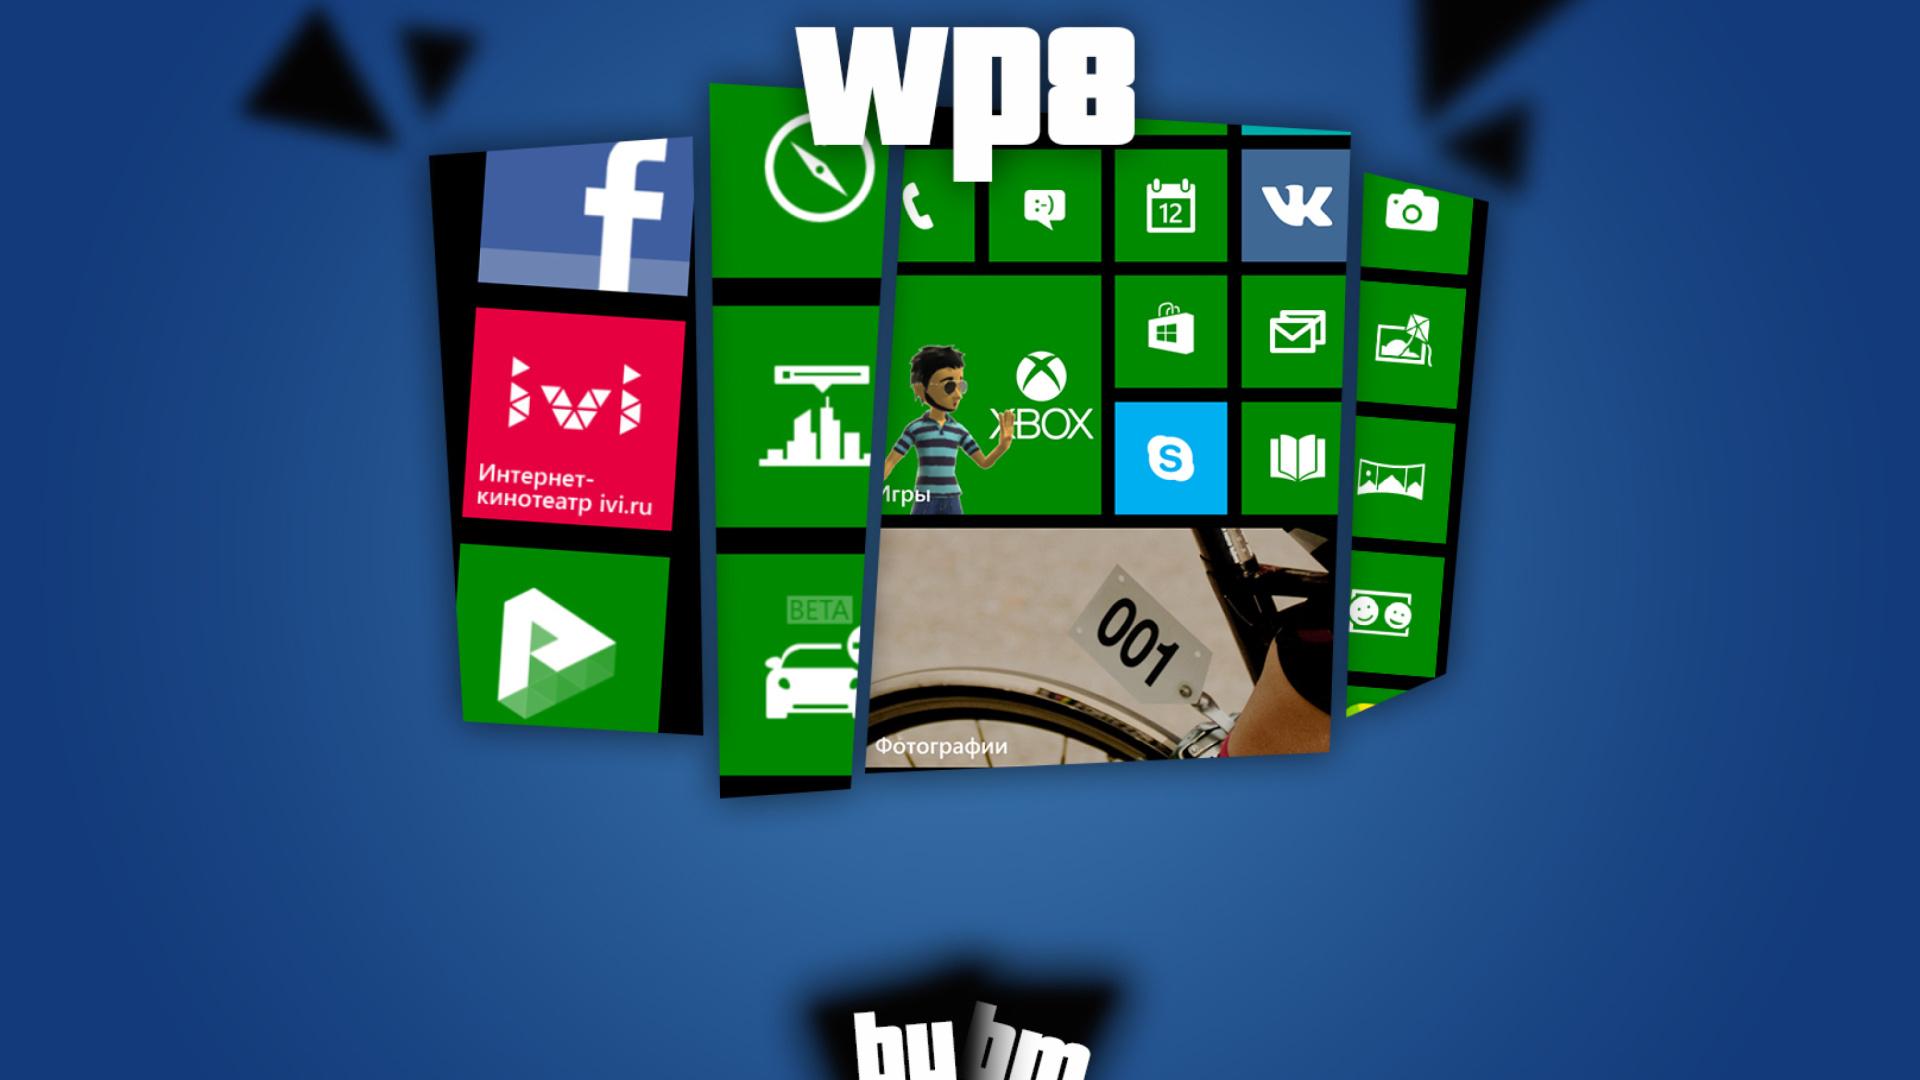 windows 8 wp 1920x1080 - photo #16